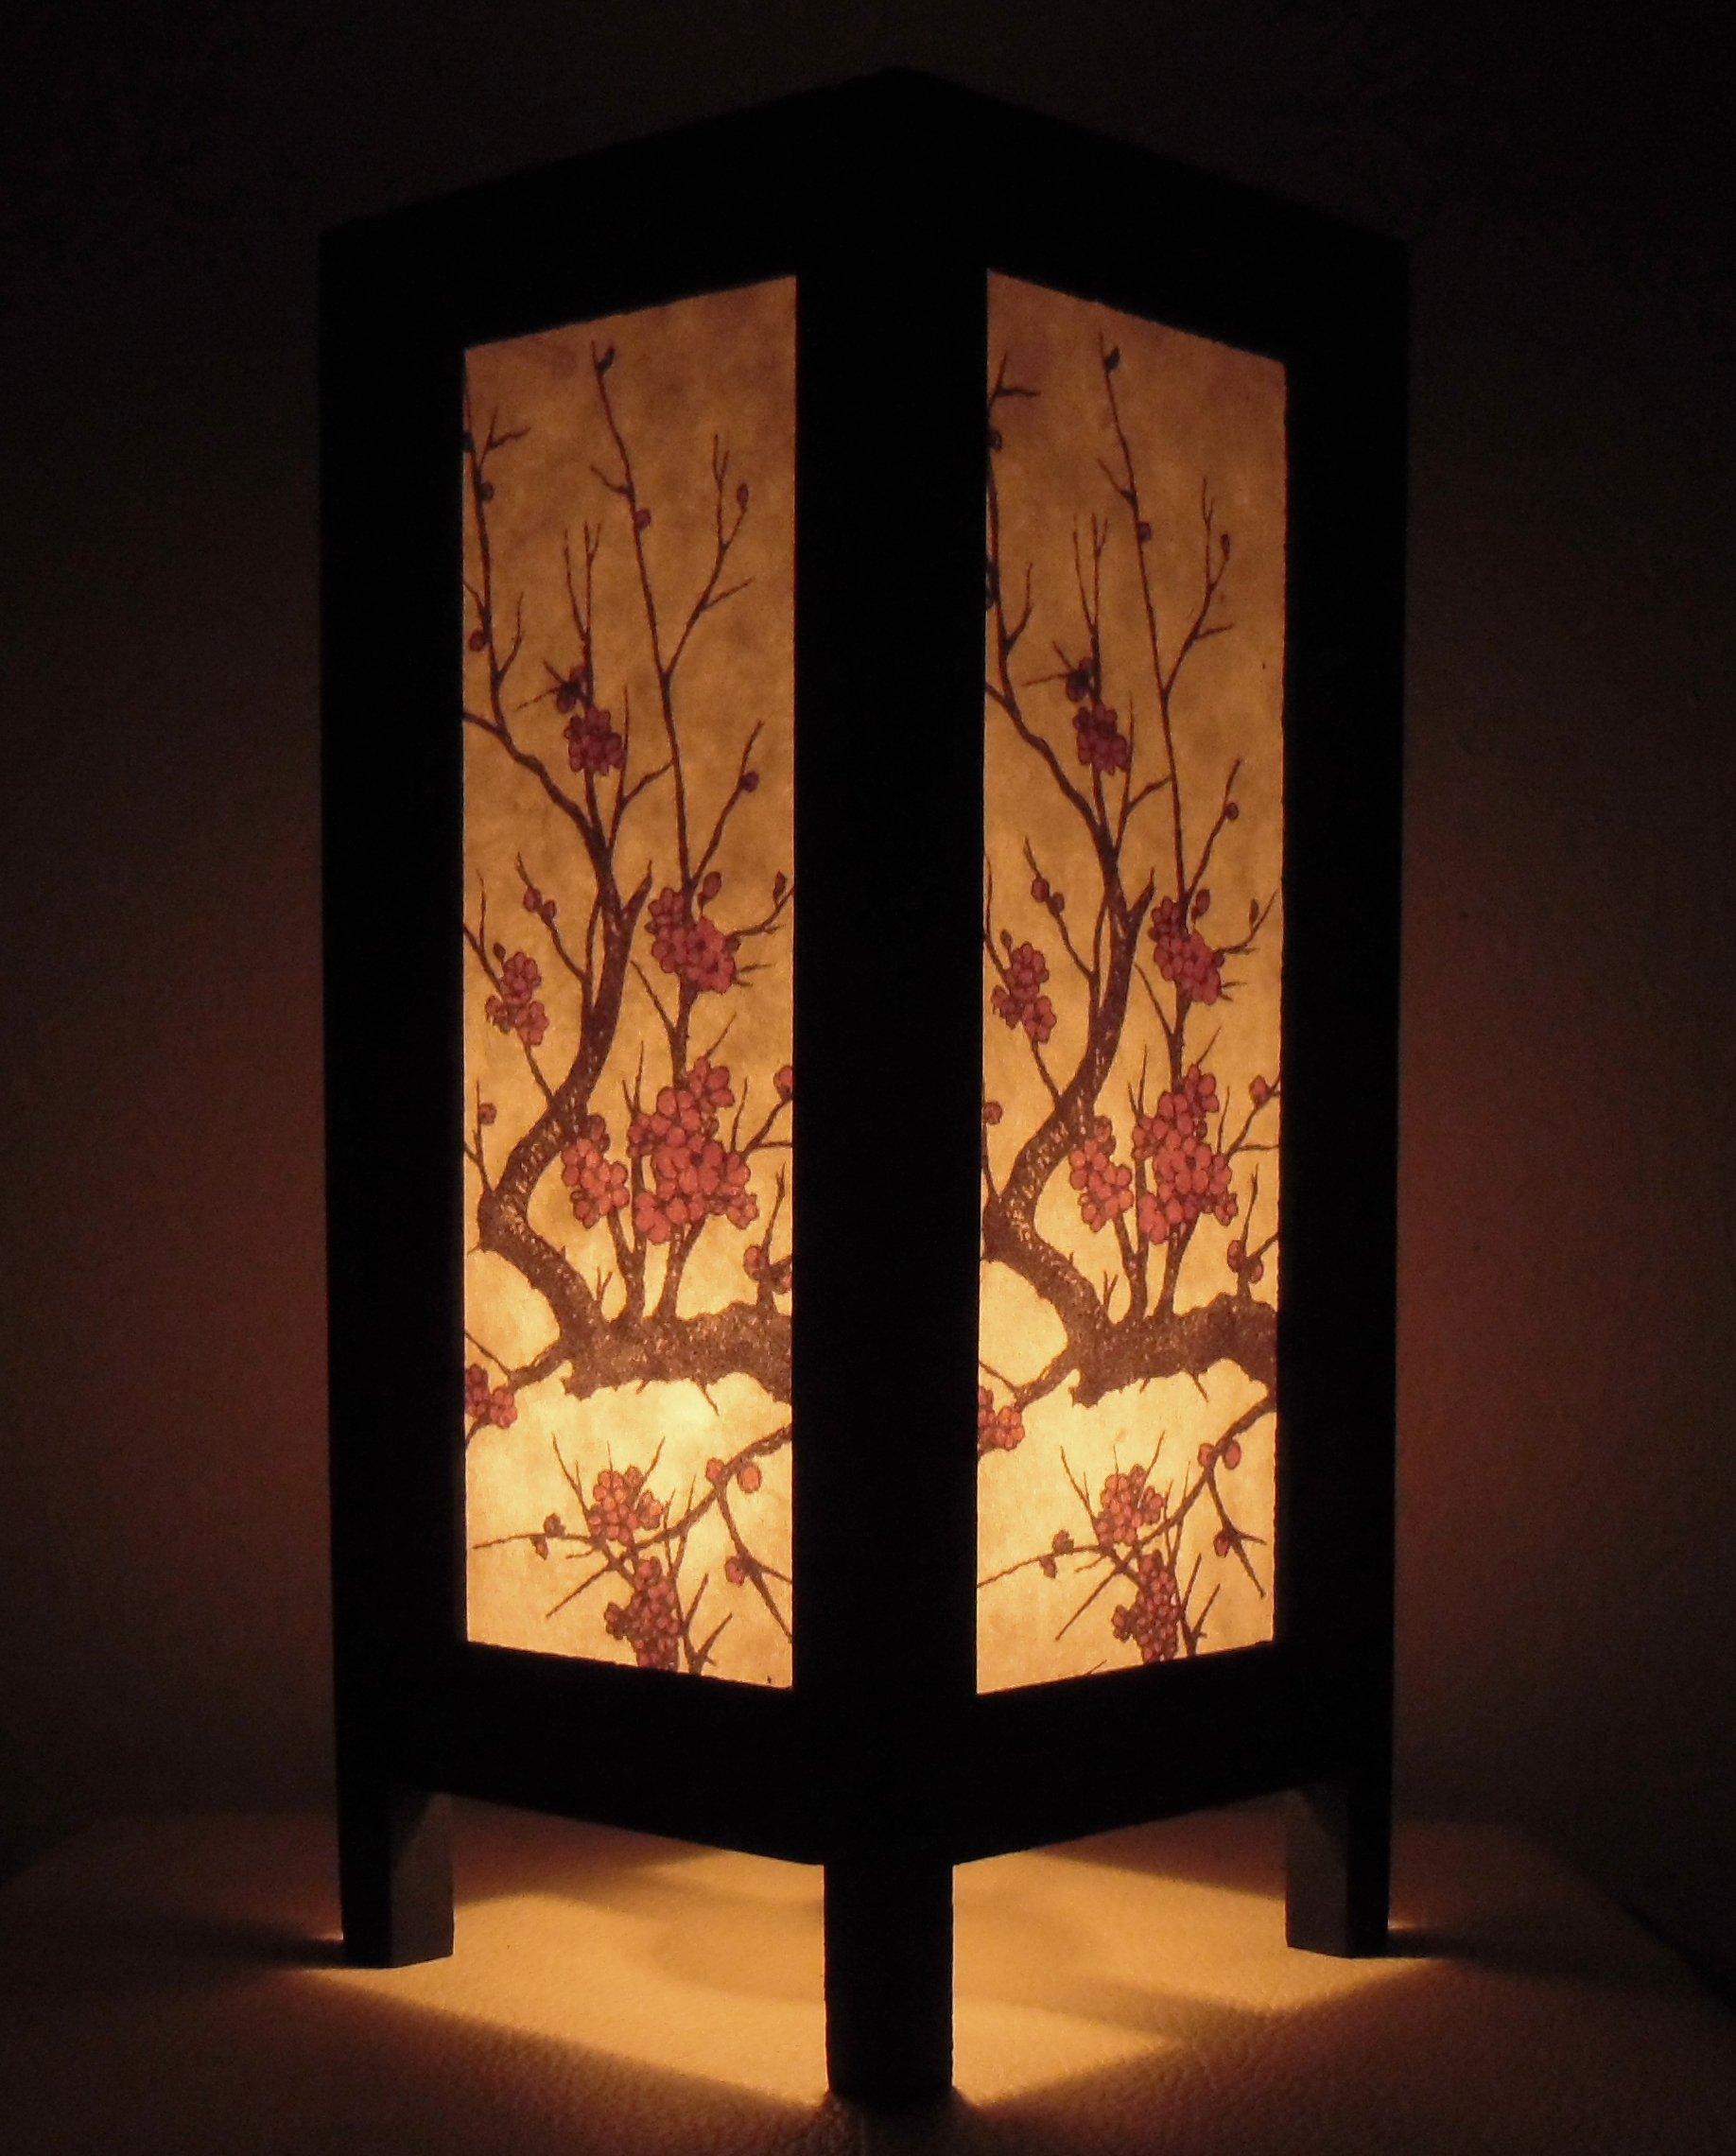 Thai Vintage Handmade ASIAN Oriental Handcraft TREE GOLD Art Buddha Style Bedside Table Light or Floor Wood Lamp Home Bedroom Decor Modern Design from Thailand